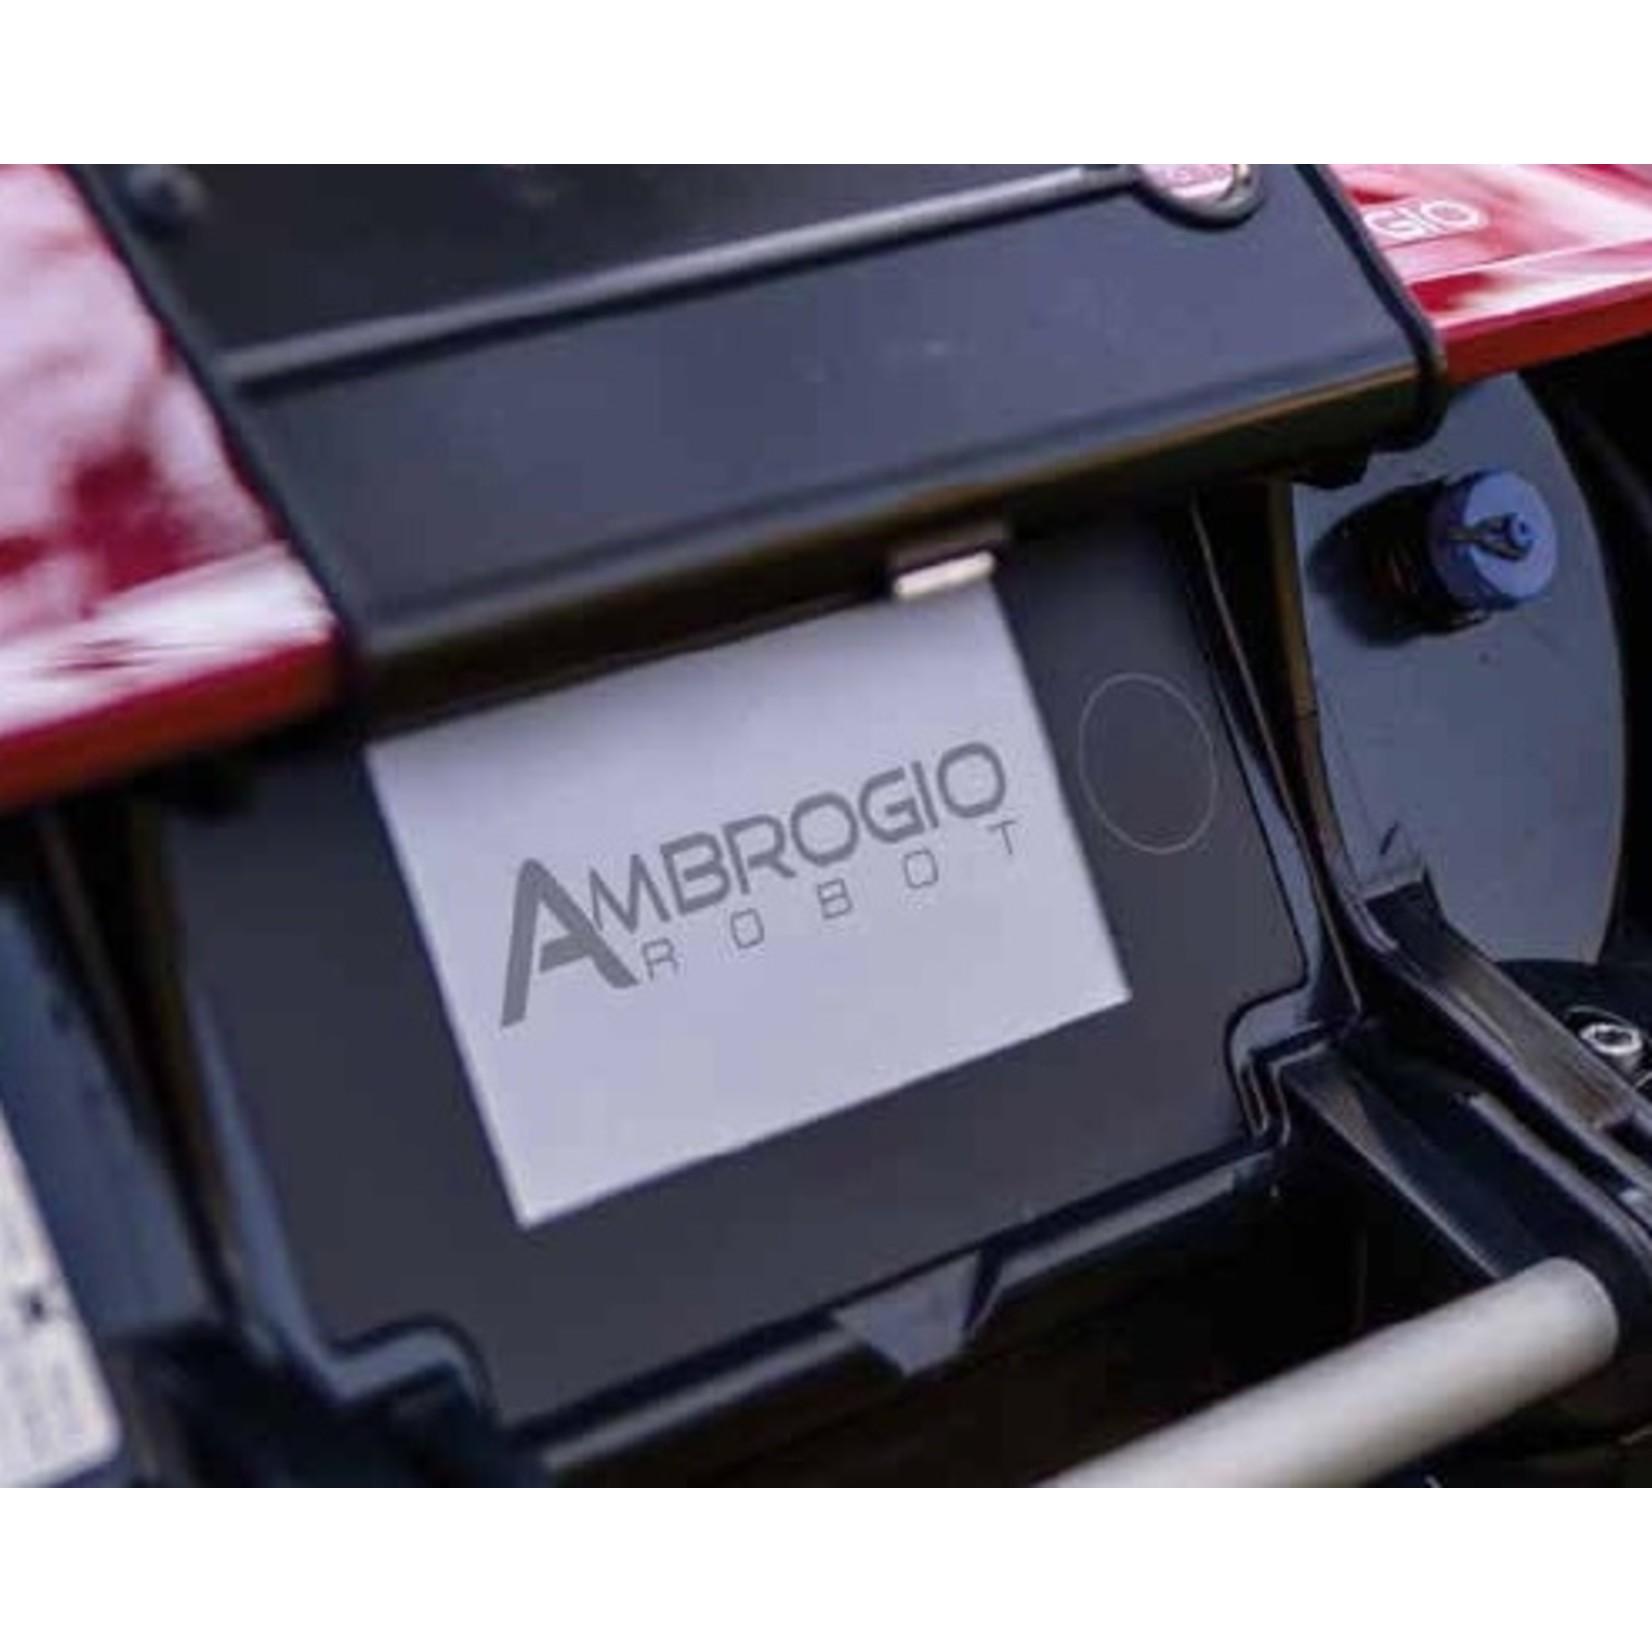 Ambrogio Ambrogio Proline L250 Deluxe Rasenmähroboter Modell 2021